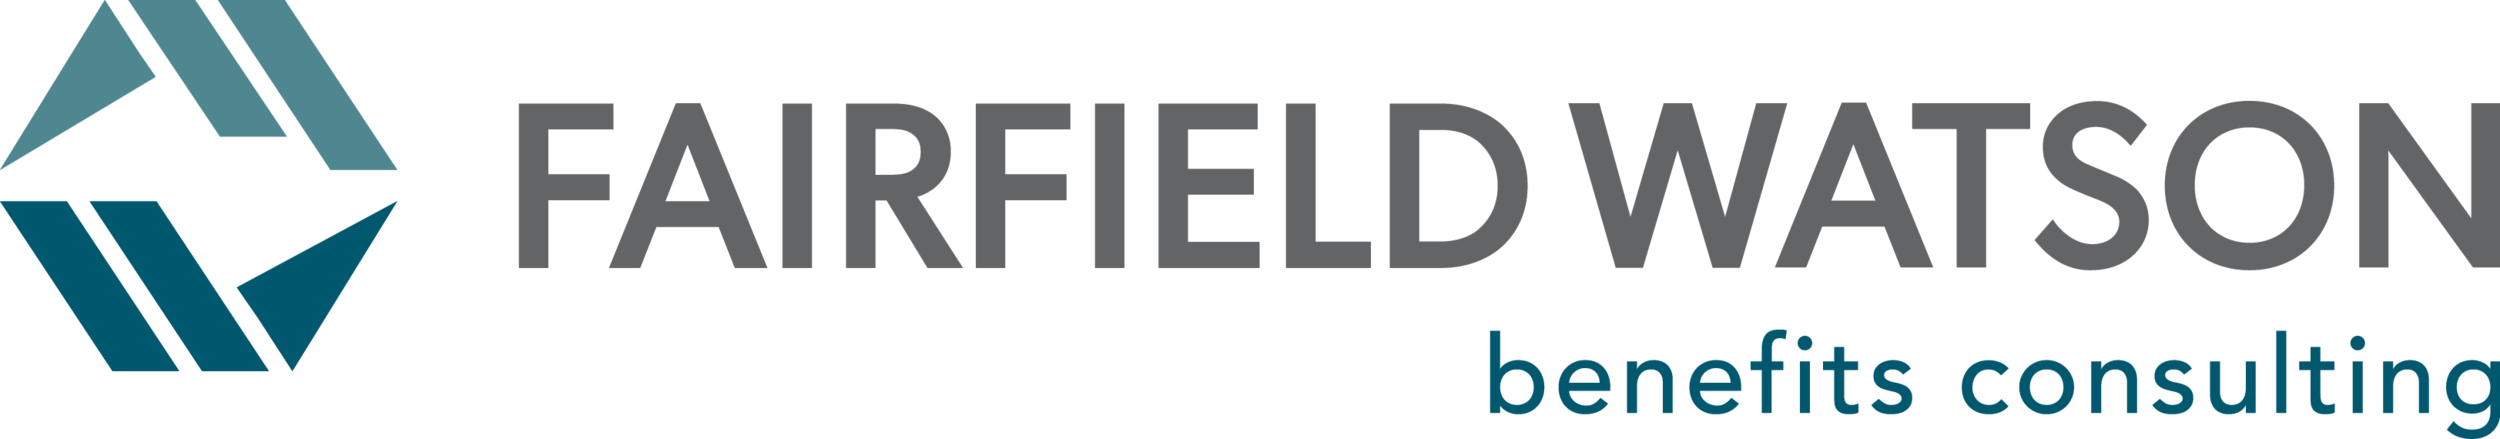 FairfieldWatson-Logo-Lockup3-BenefitsConsulting-CMYK.PNG